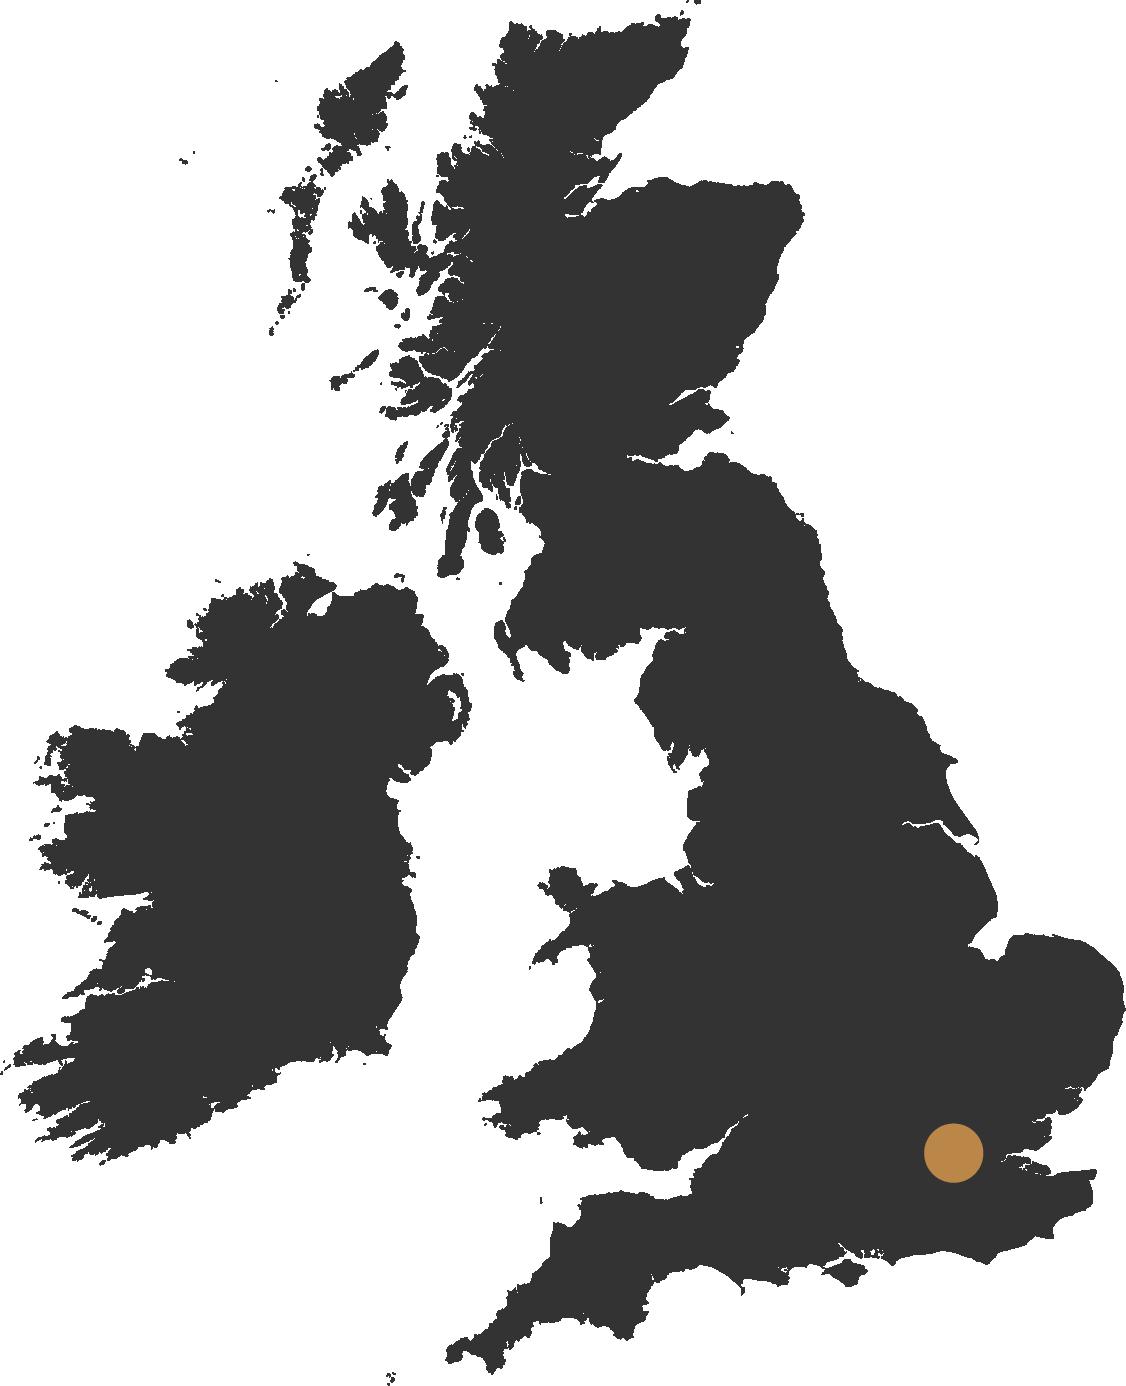 map of uk showing london